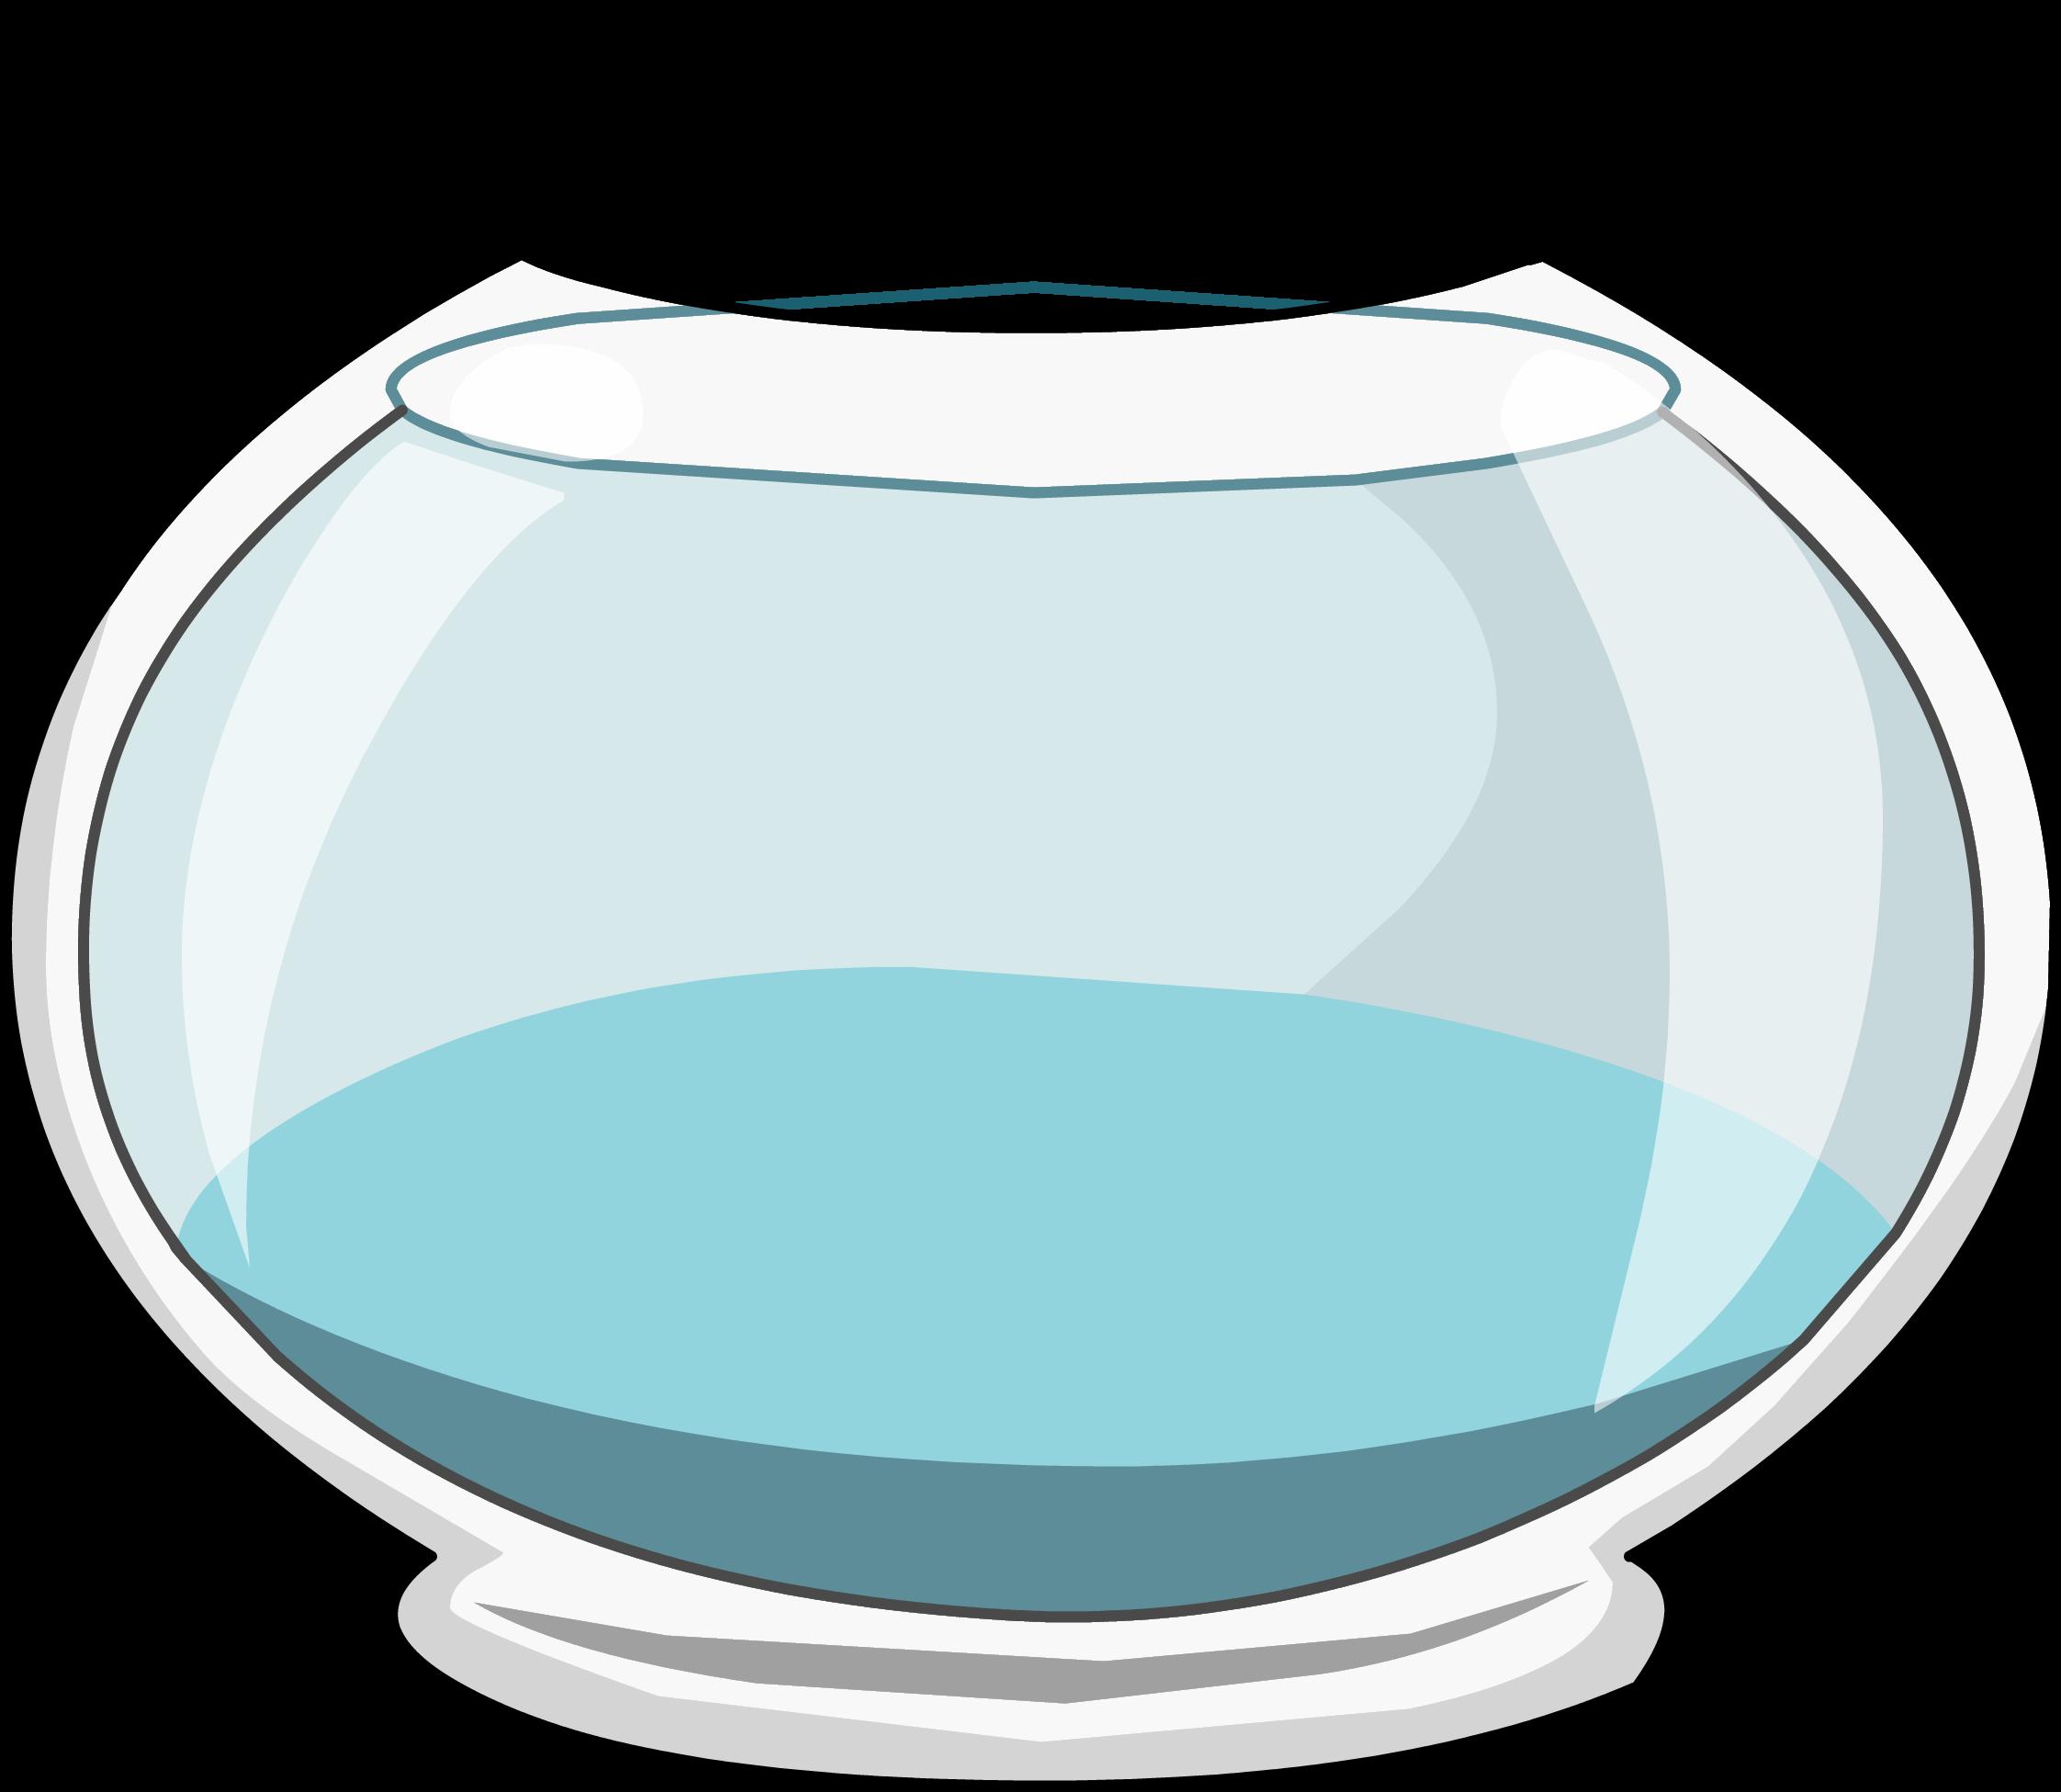 Clip Art Fish Bowl Clipart fish bowl clip art clipart best tumundografico